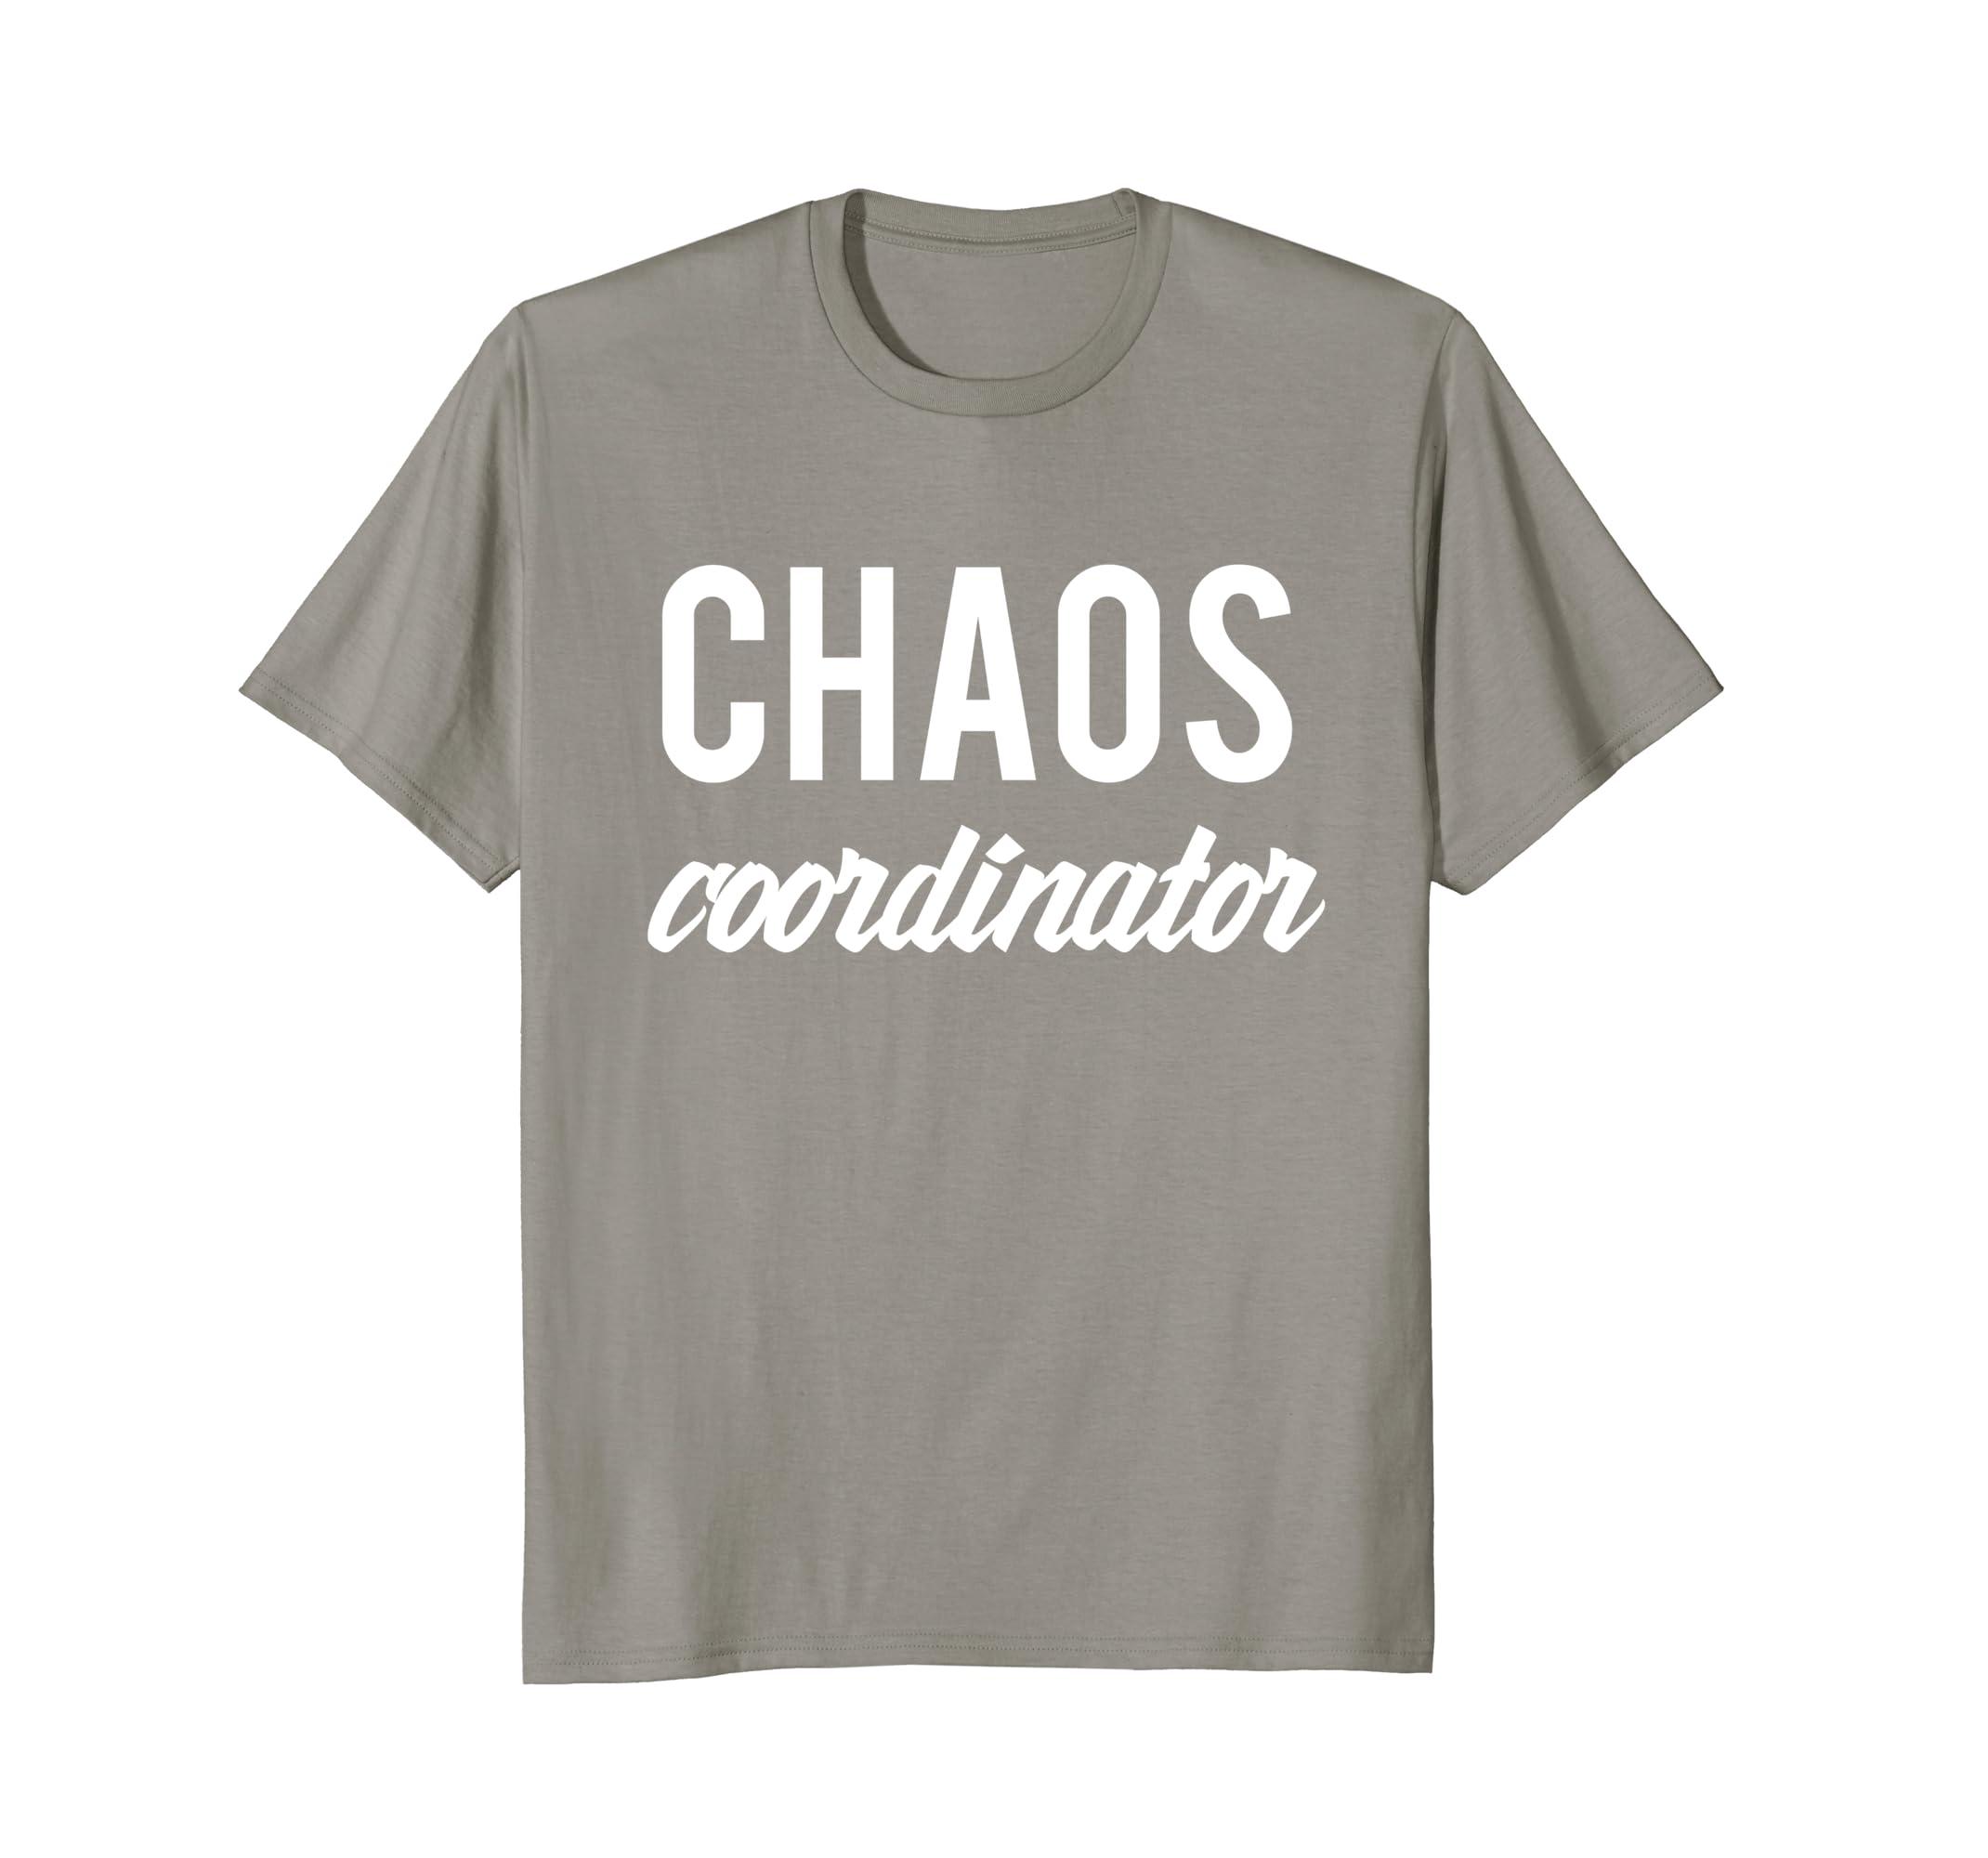 aef8a741e0d8c Chaos Coordinator T-shirt Organized Tee-ah my shirt one gift